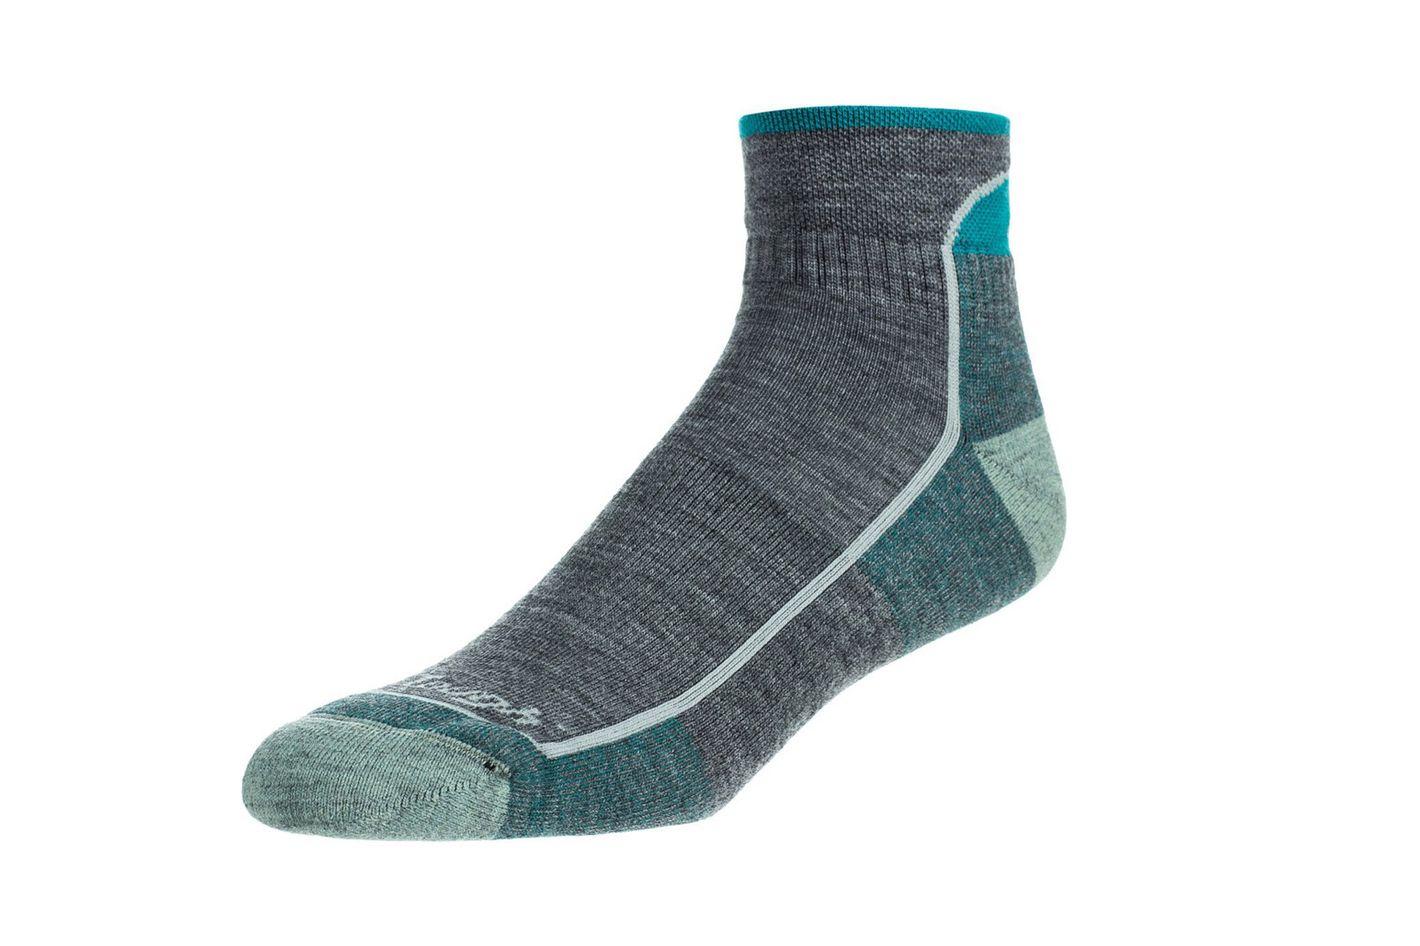 Darn Tough Vermont Women's ¼ Cushion Socks